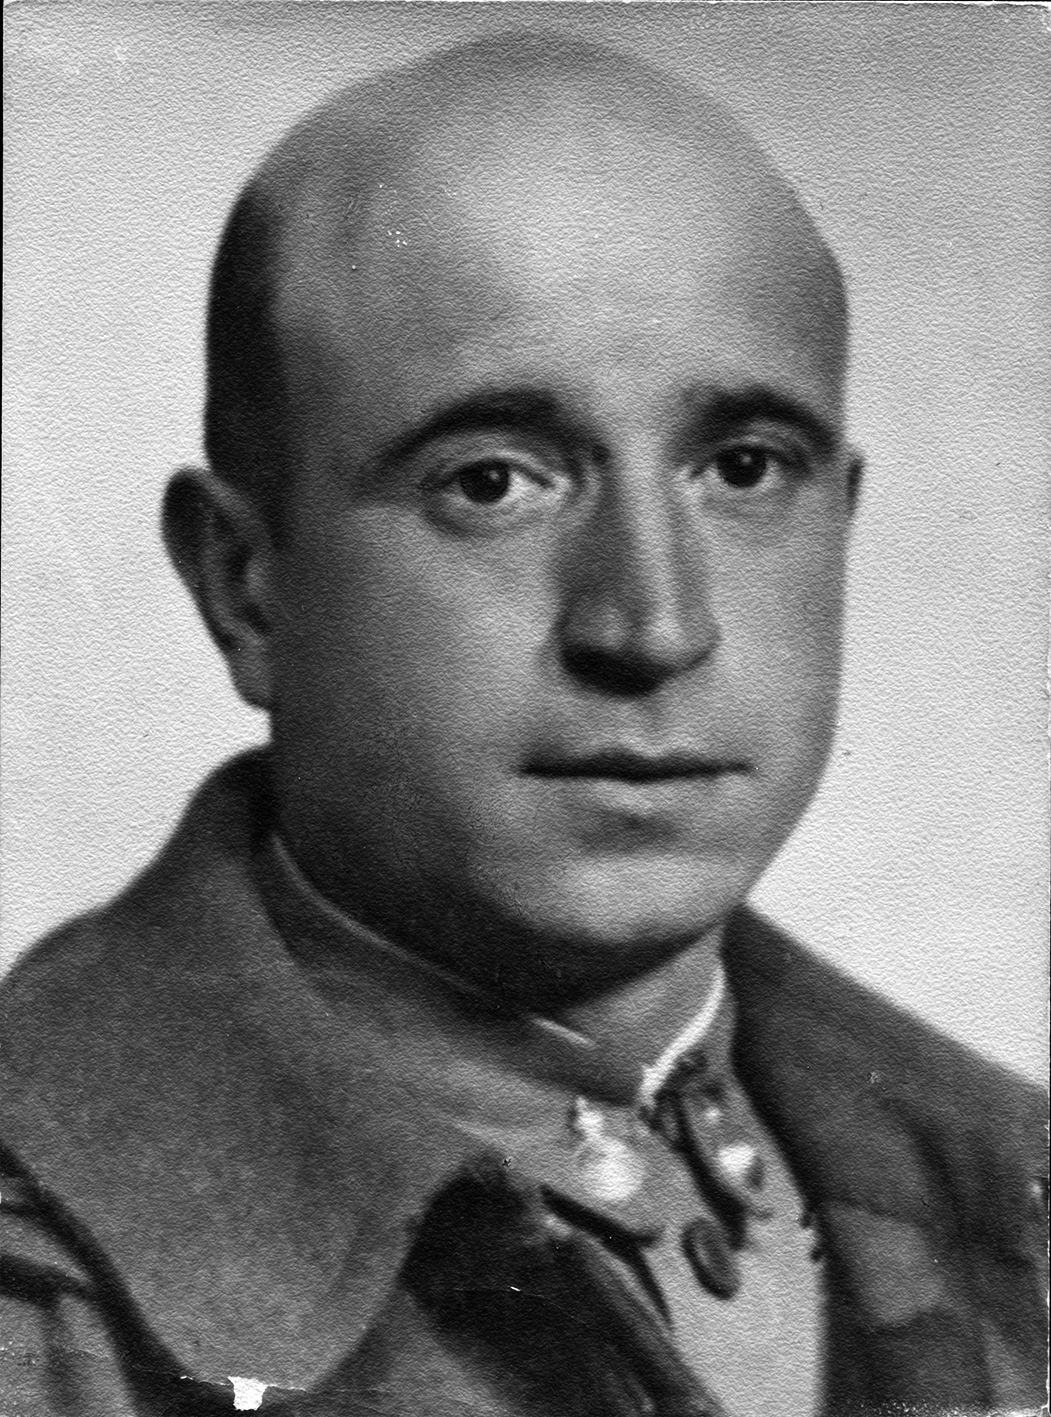 Mi abuelo materno, Luis Pellicena Bolsa